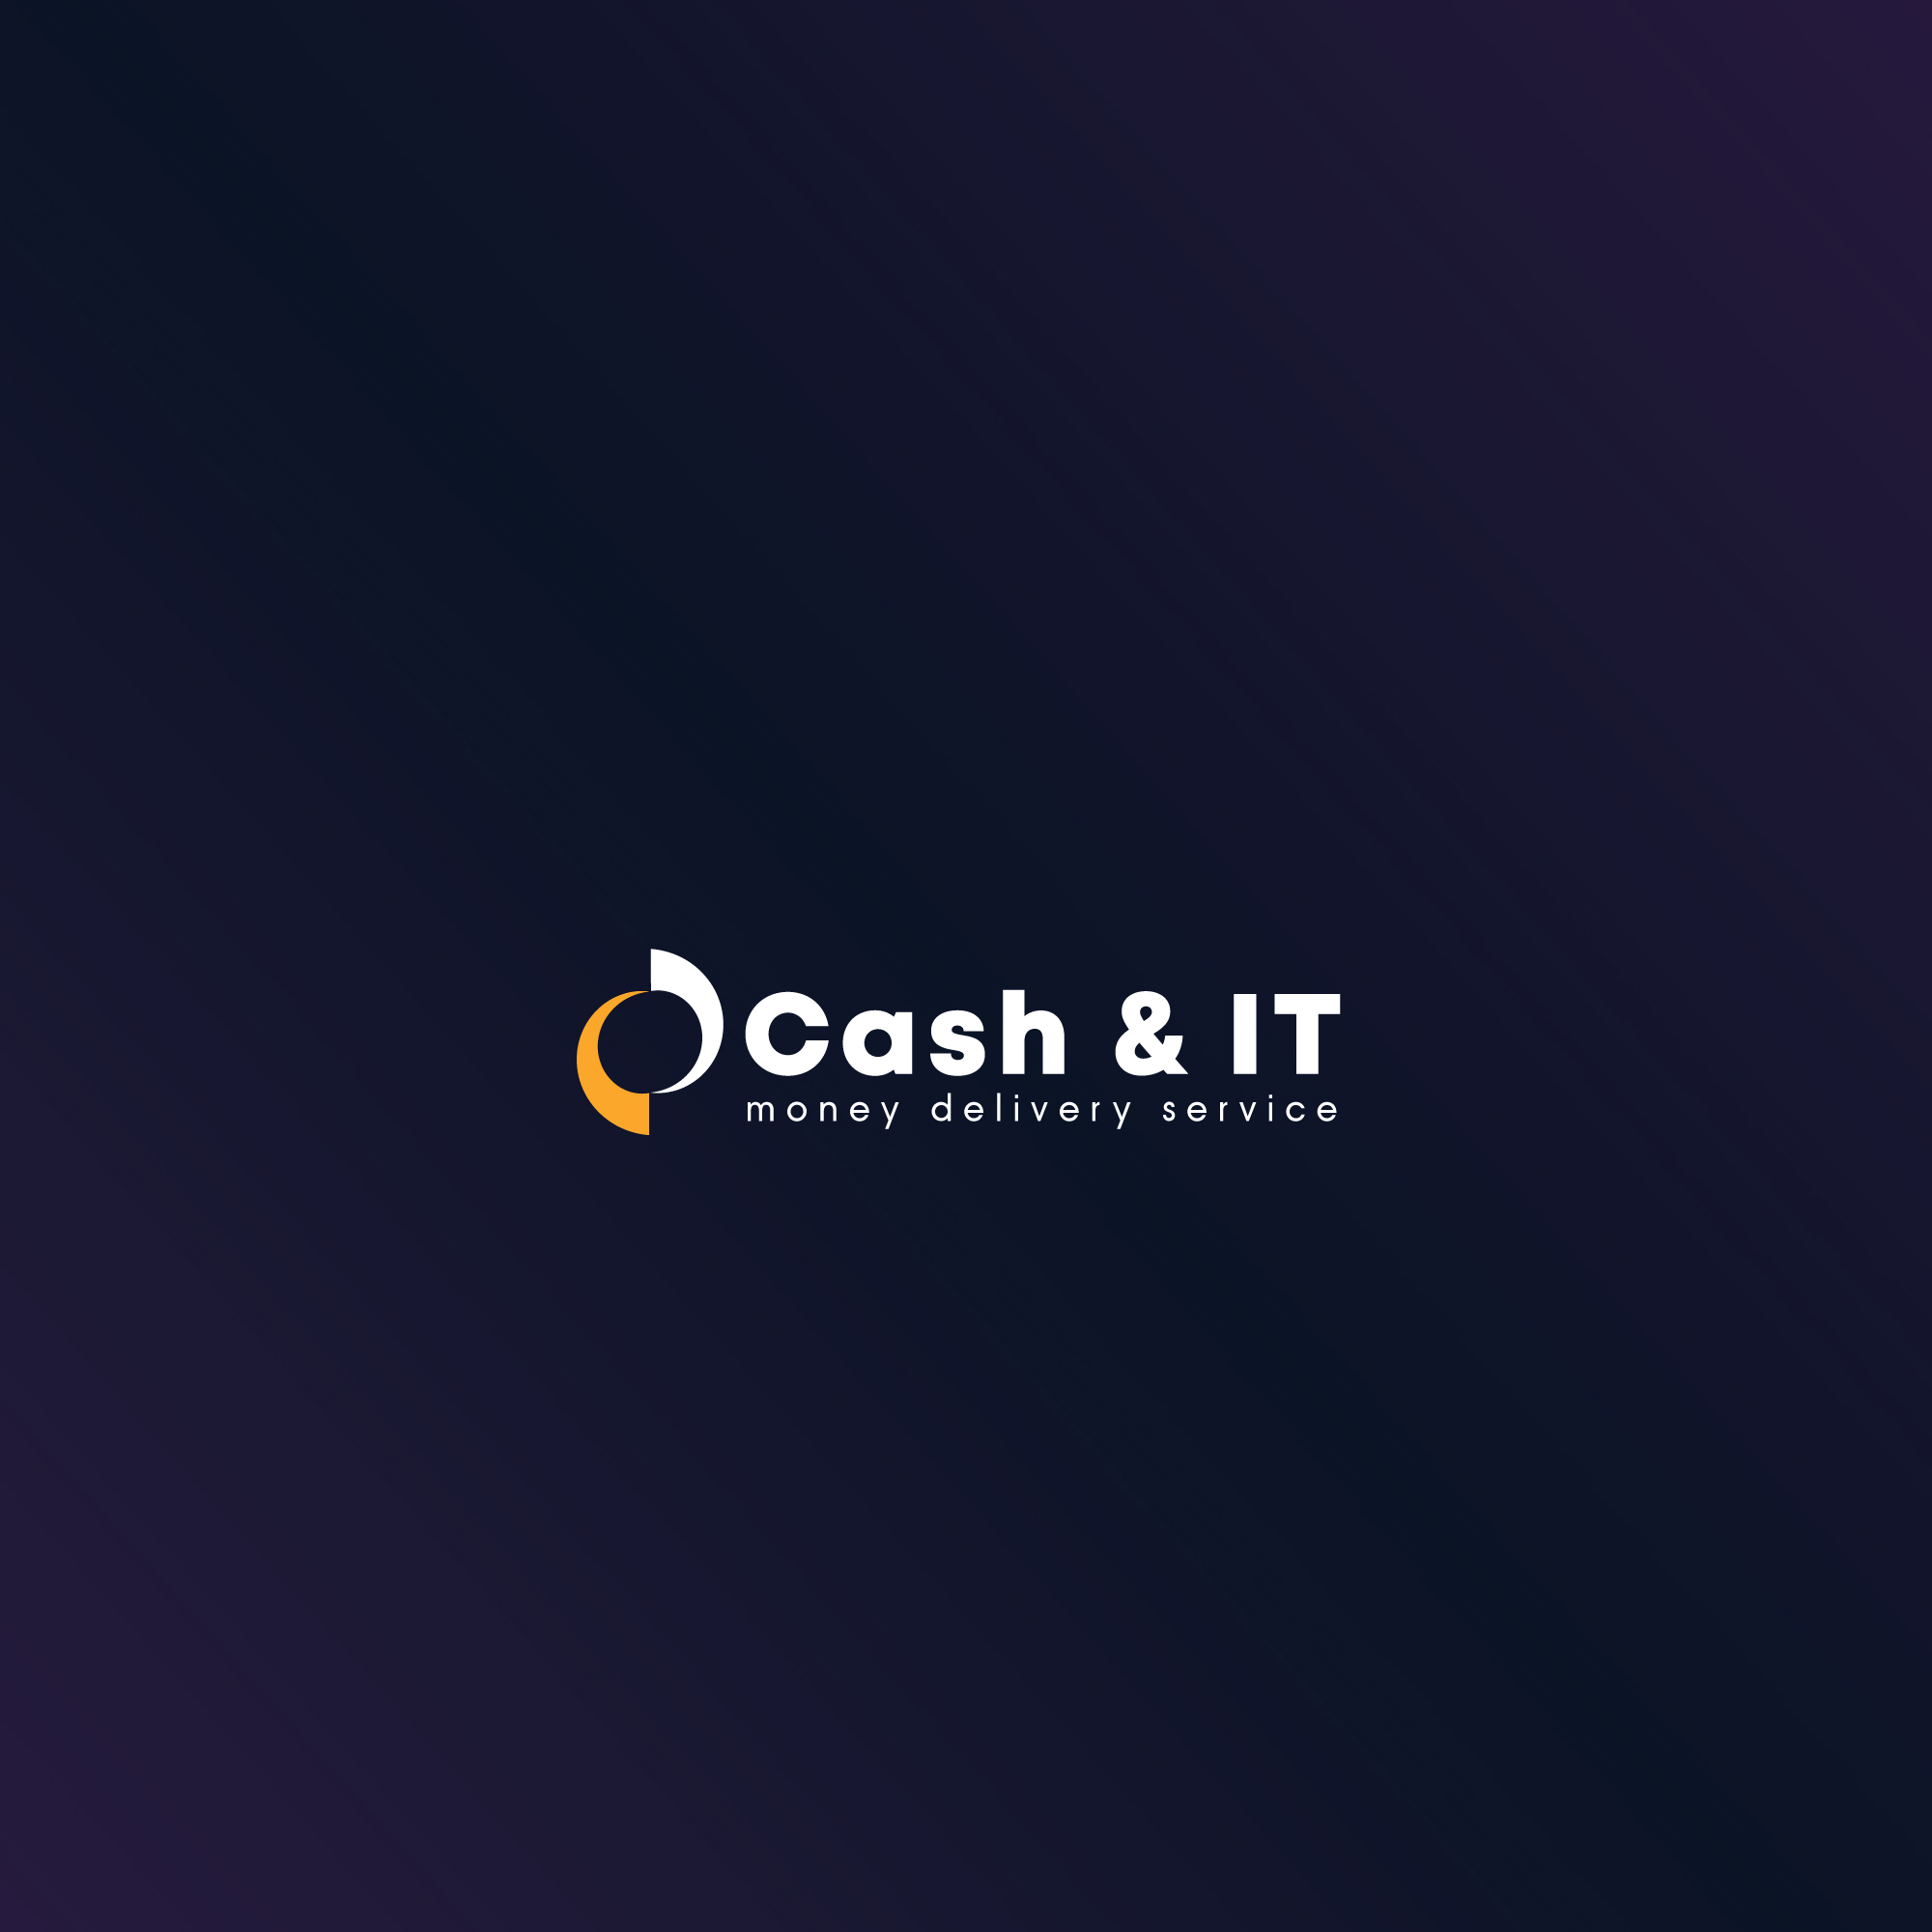 Логотип для Cash & IT - сервис доставки денег фото f_9005fdfaee82da15.jpg